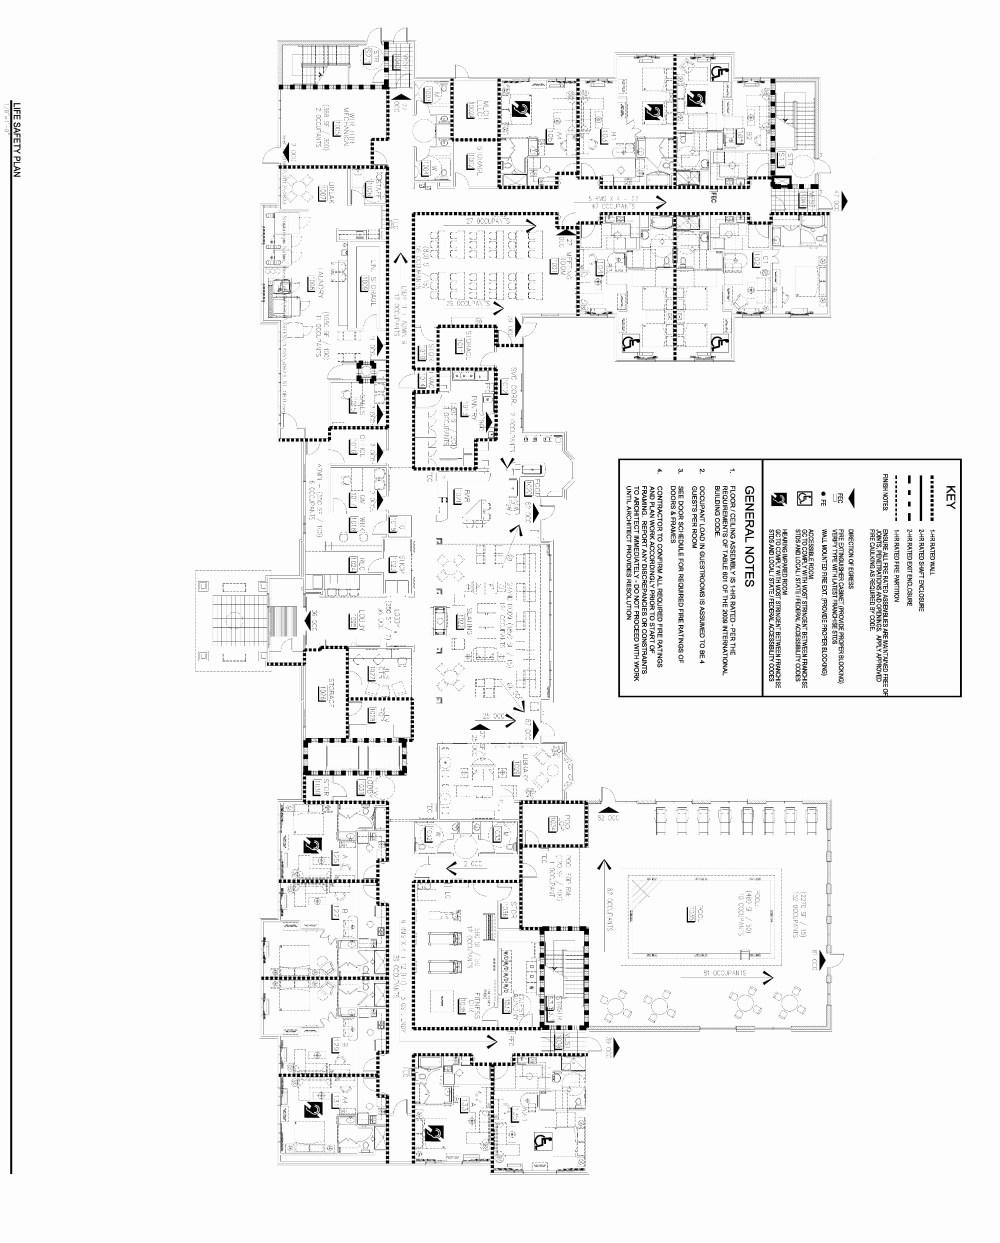 medium resolution of 2000x2486 architectural floor plans beautiful architecture symbols cliparts